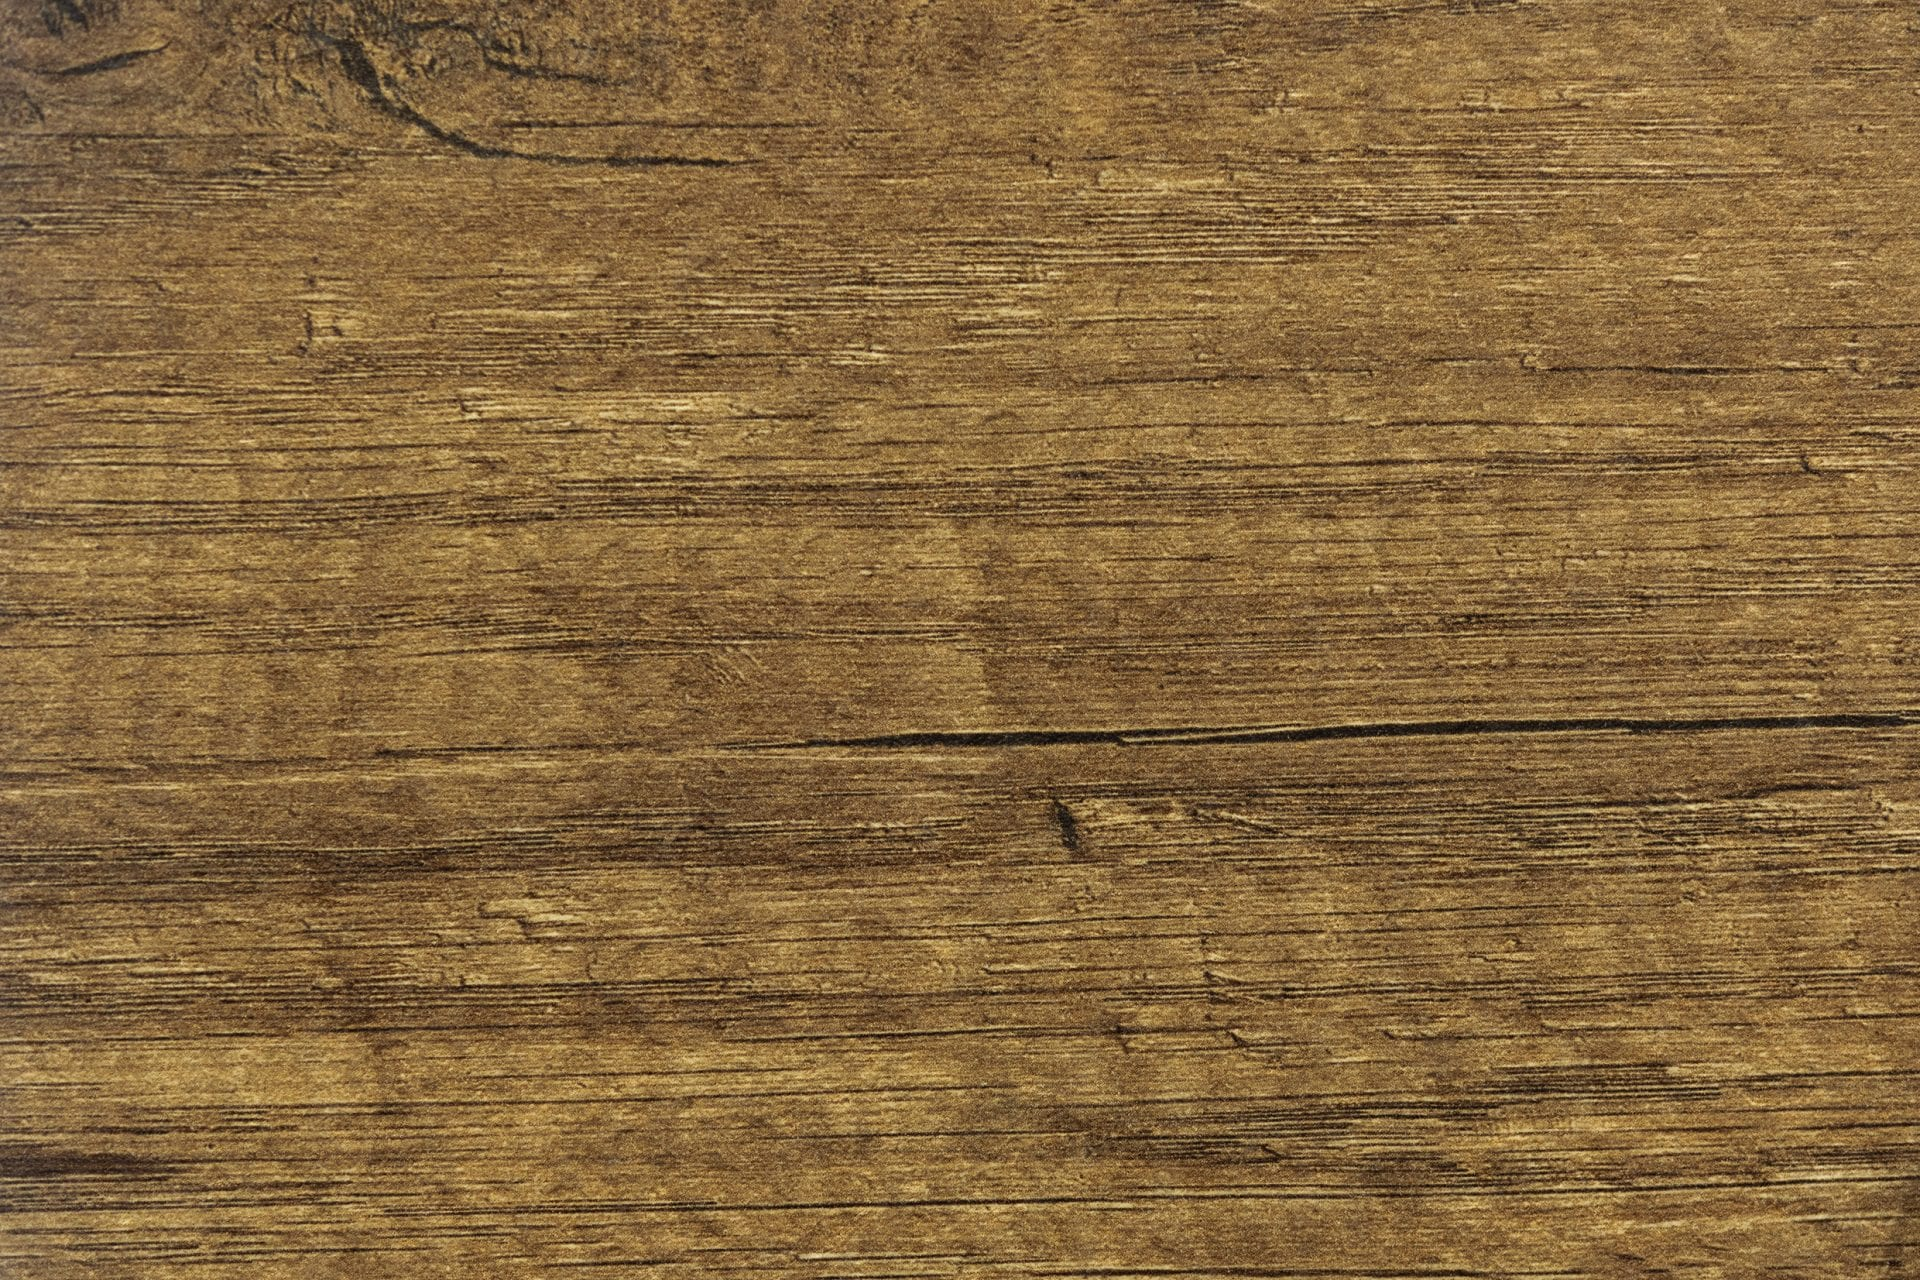 Safari Oak Close Laminate Worktop by Topform